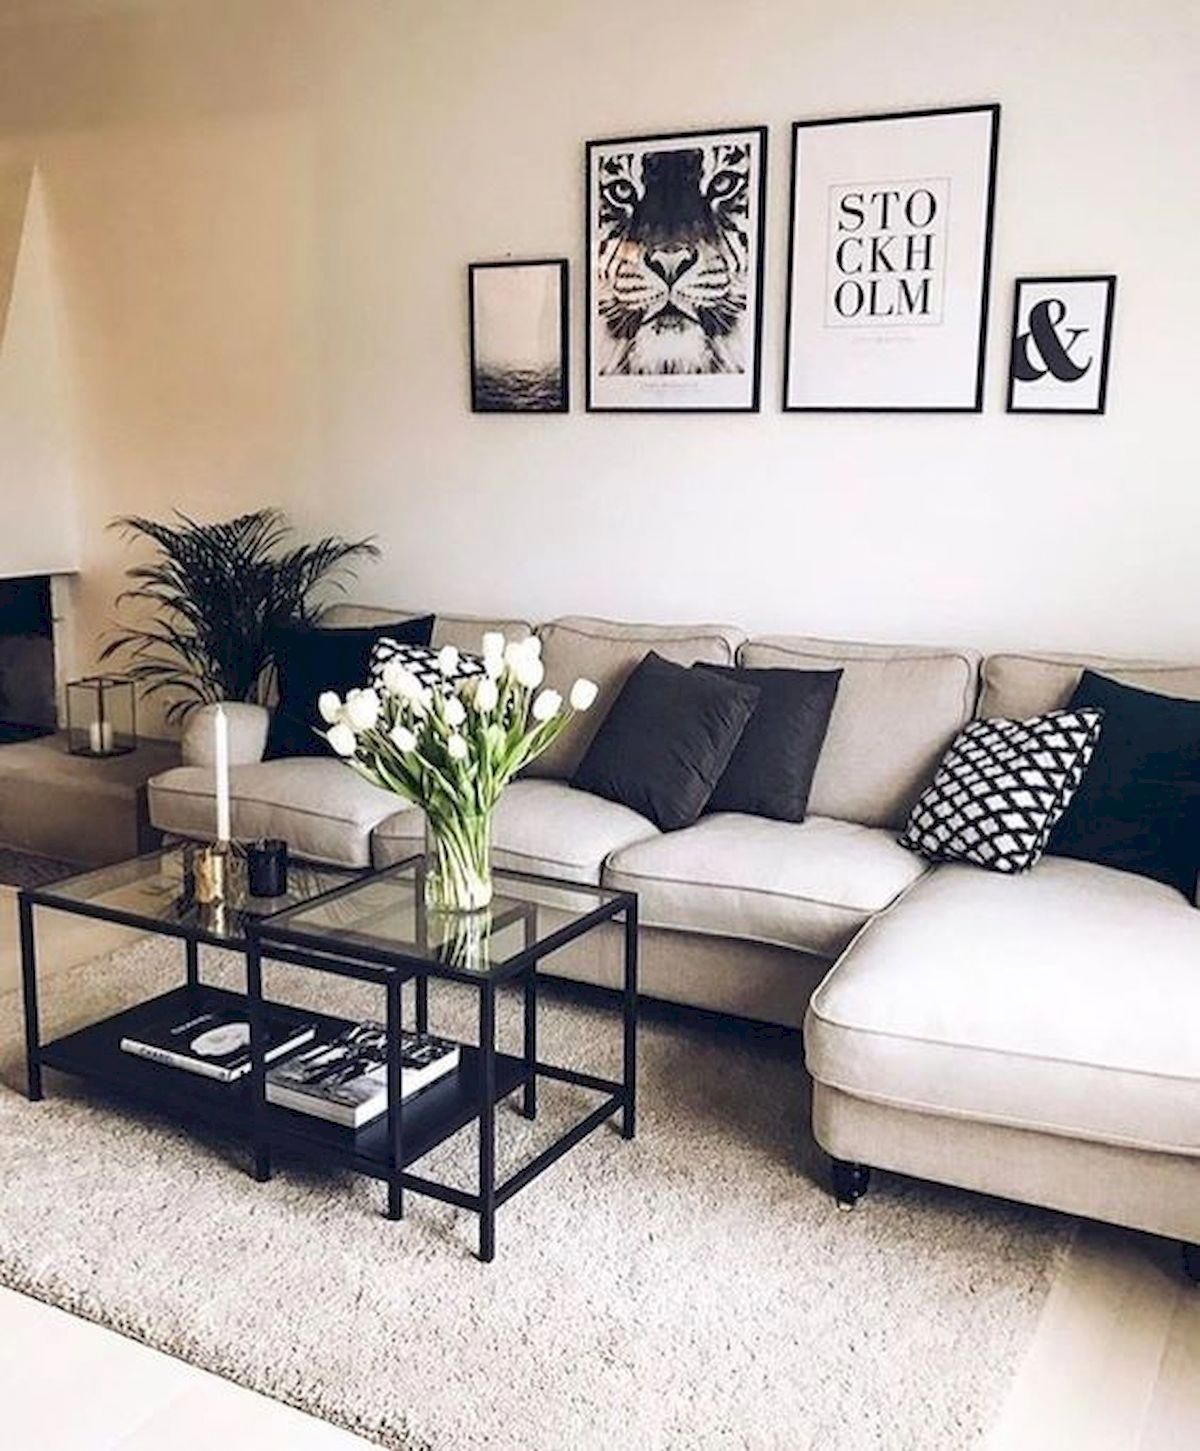 livingroomdecoration interiors exteriors in 2019 living room rh pinterest com